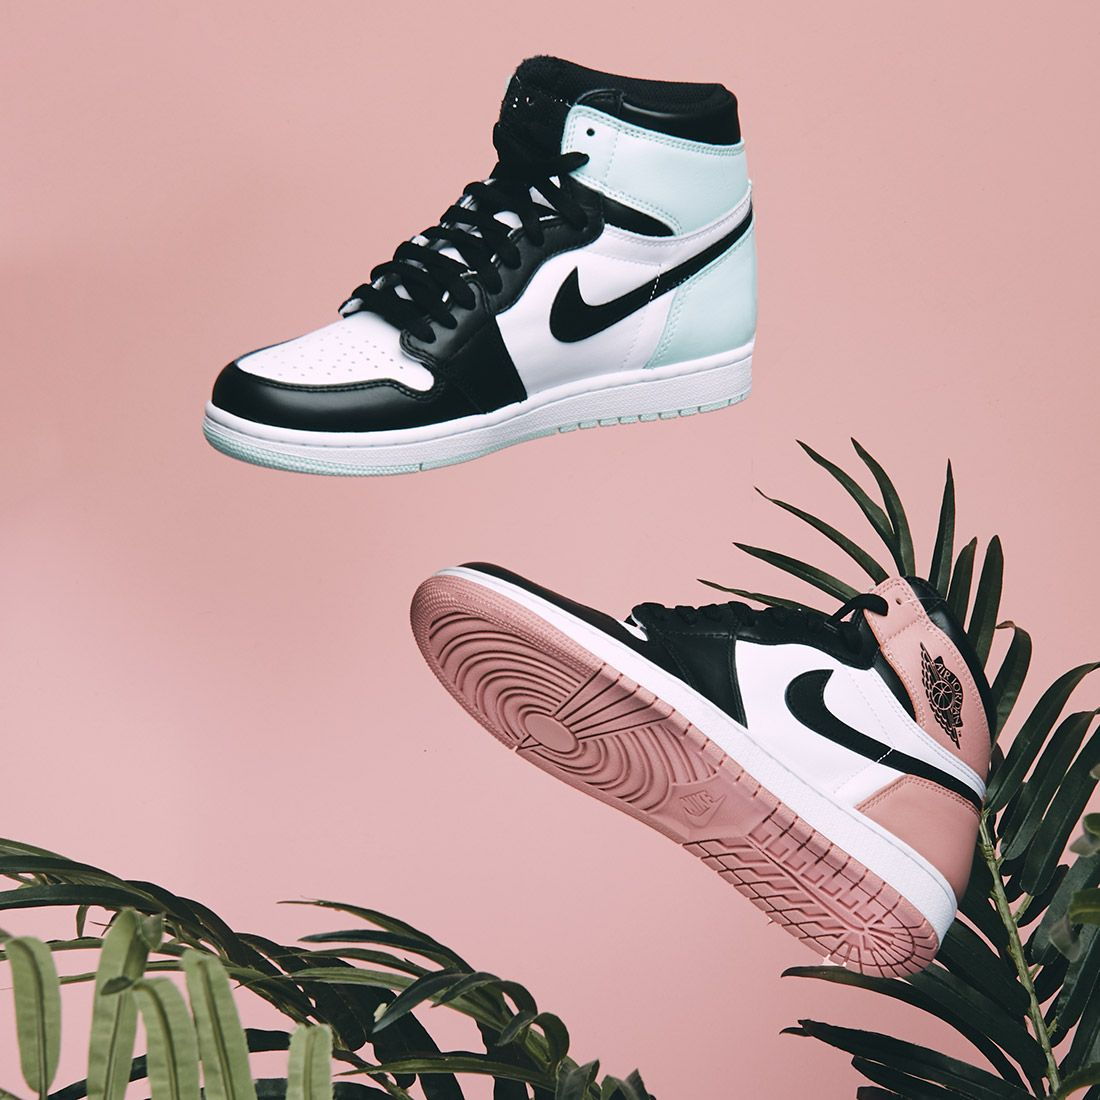 Social Status X Air Jrodan 1 Igloo Rust Pink Sneaker Freaker 6